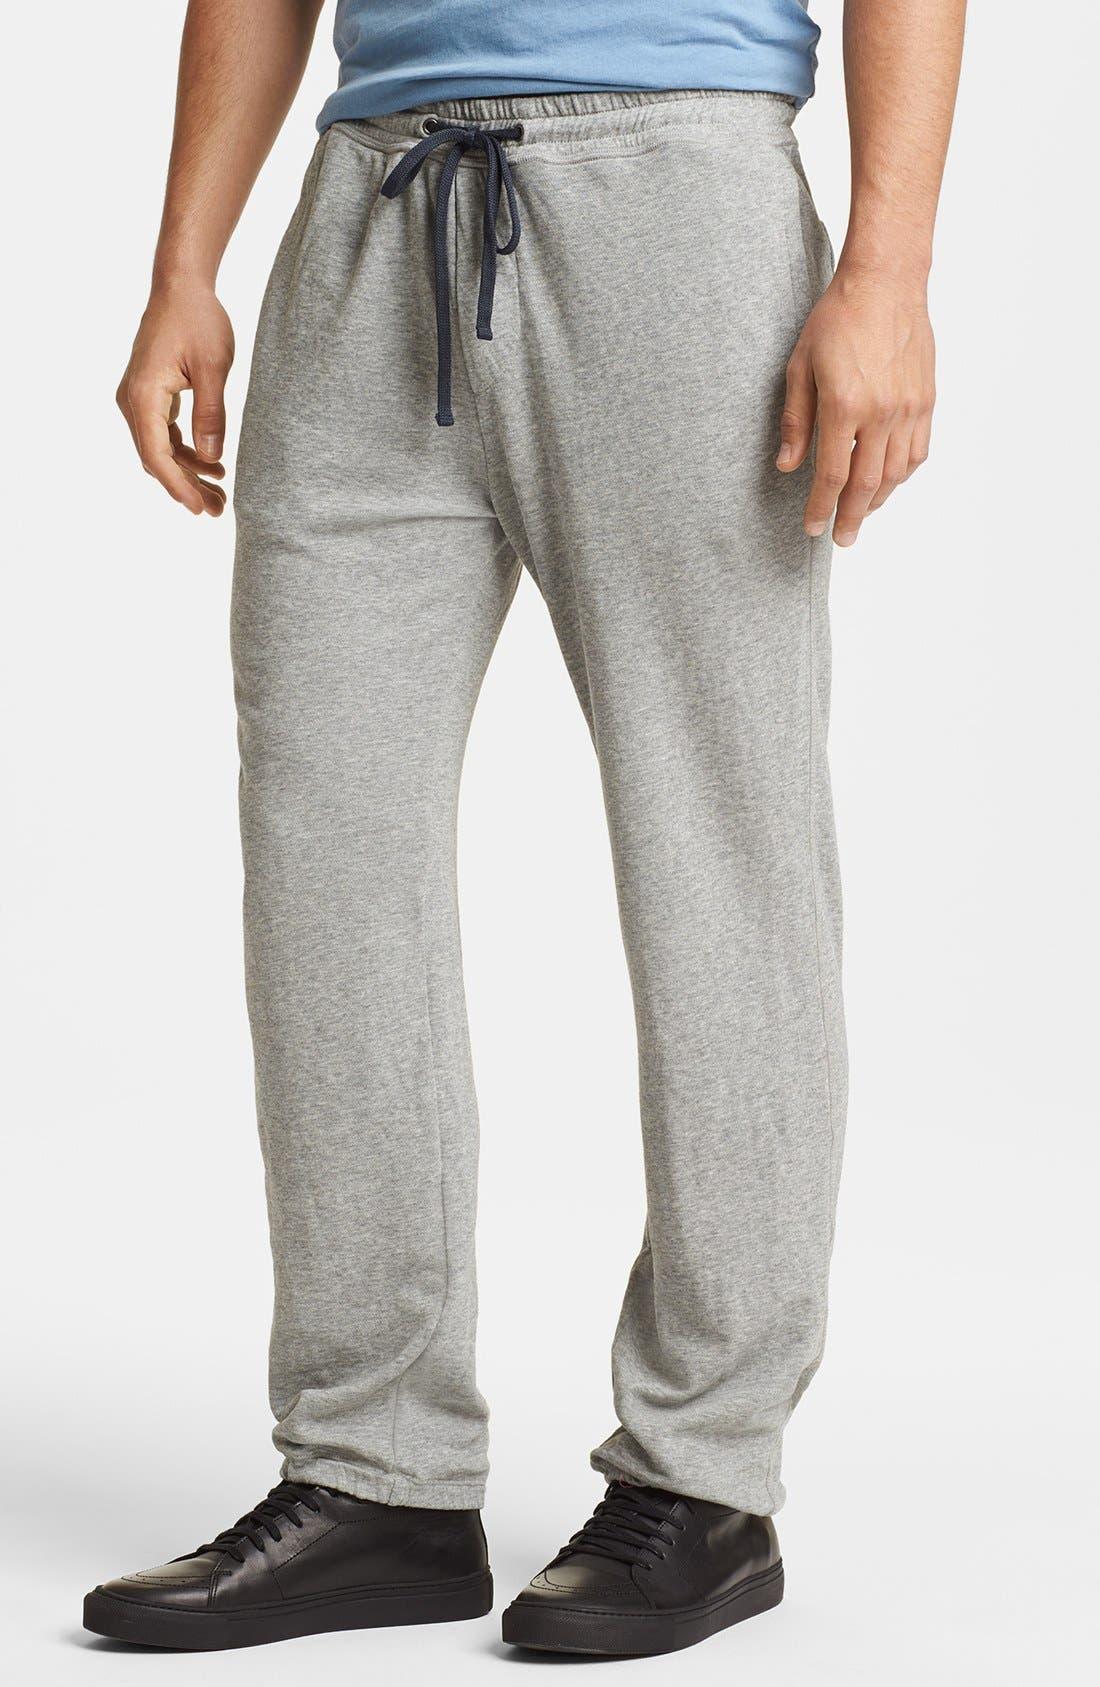 James Perse Classic Sweatpants